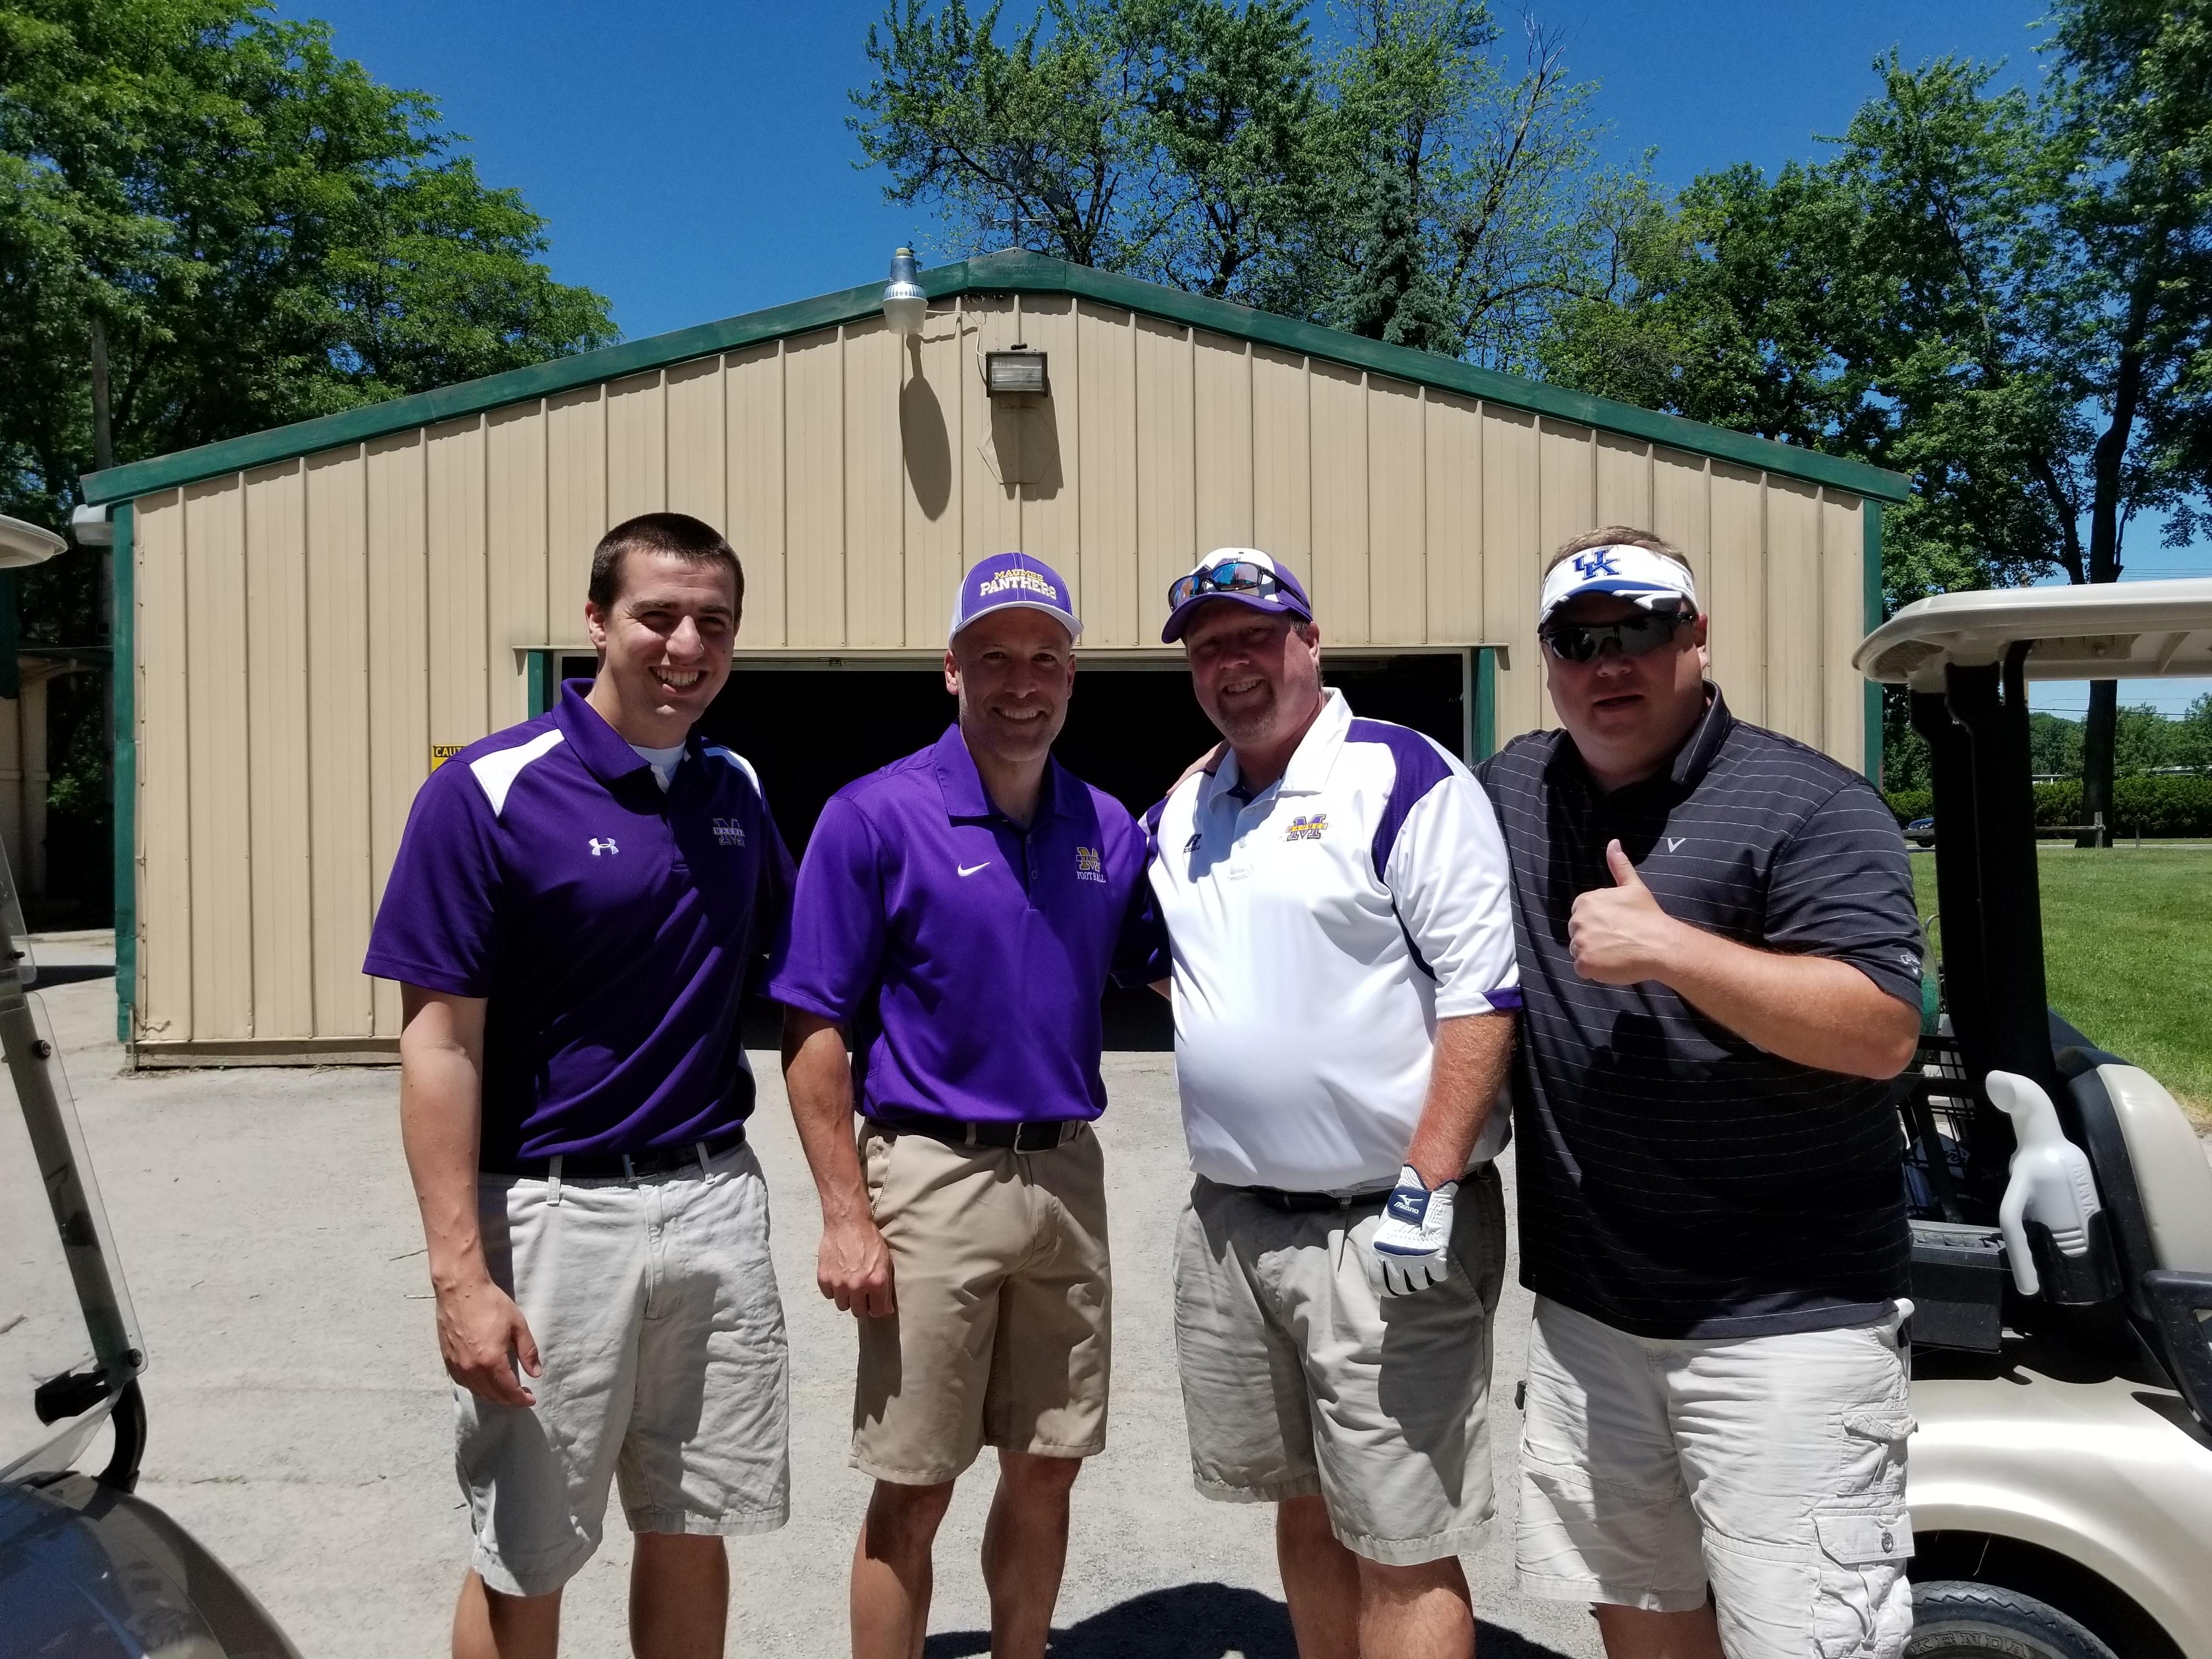 Kazmaier Memorial Scholarship Golf Outing